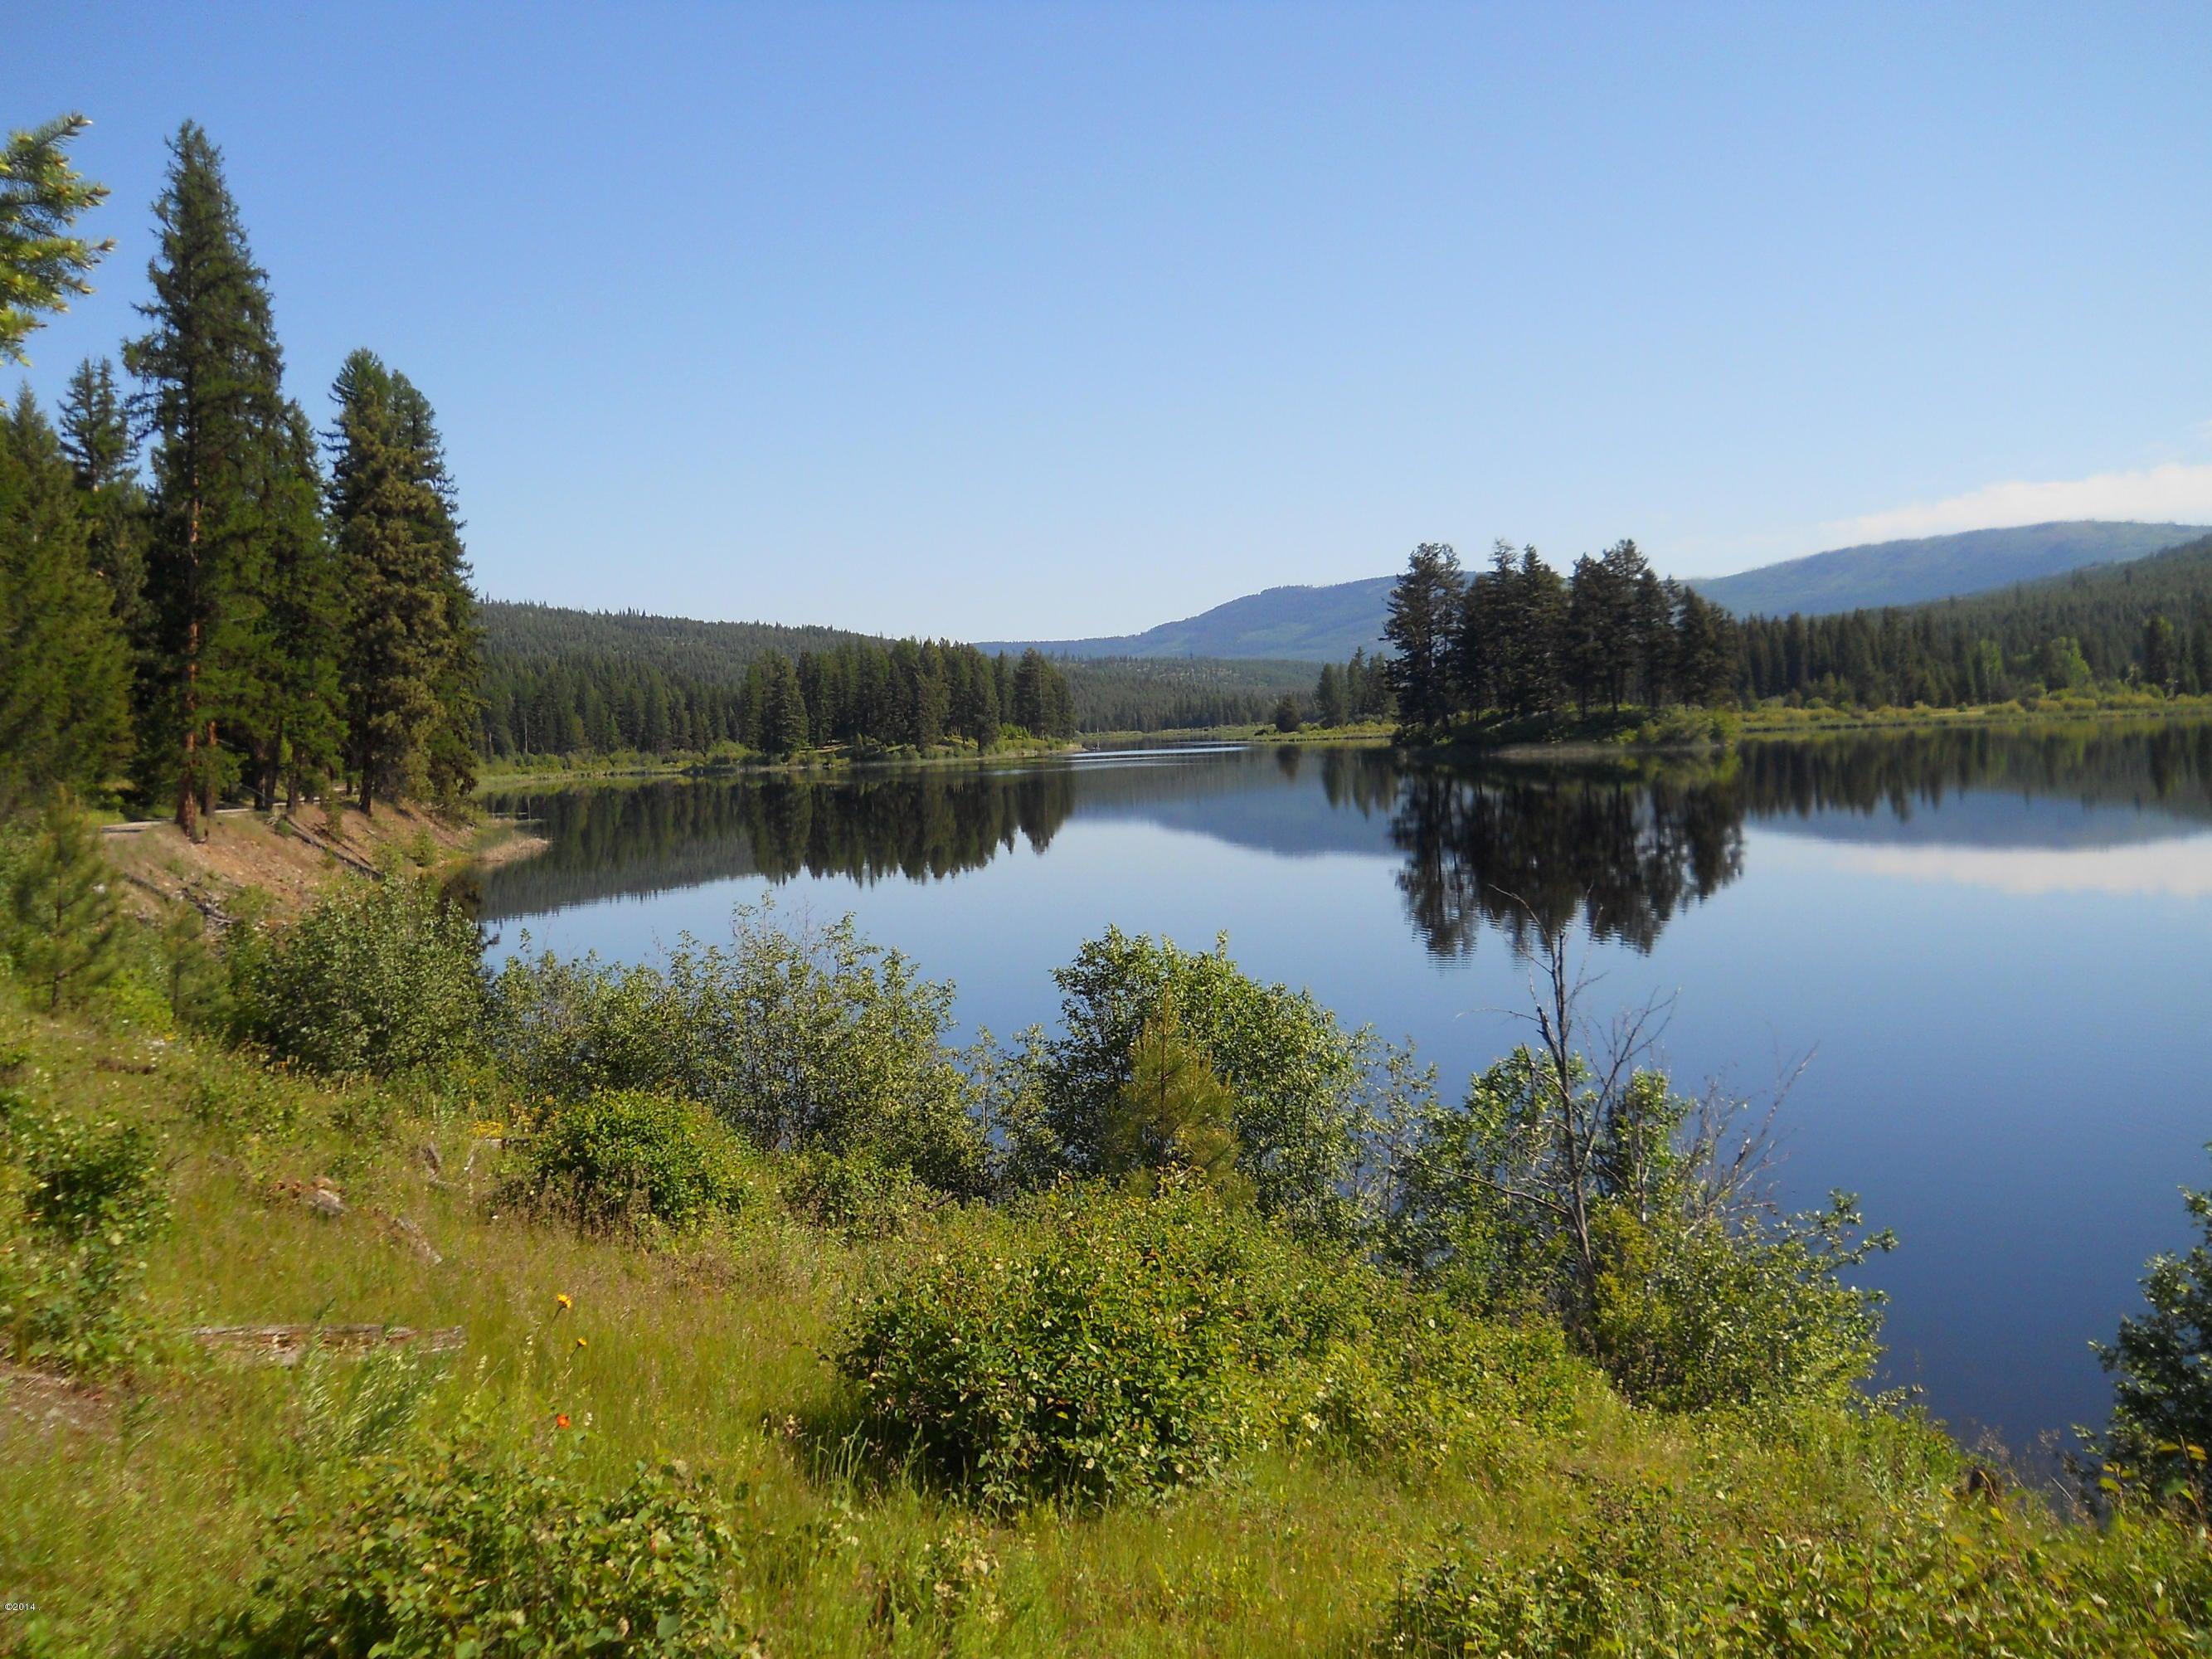 Land for Sale at Lot 1 Island Lake Road Lot 1 Island Lake Road Libby, Montana 59923 United States